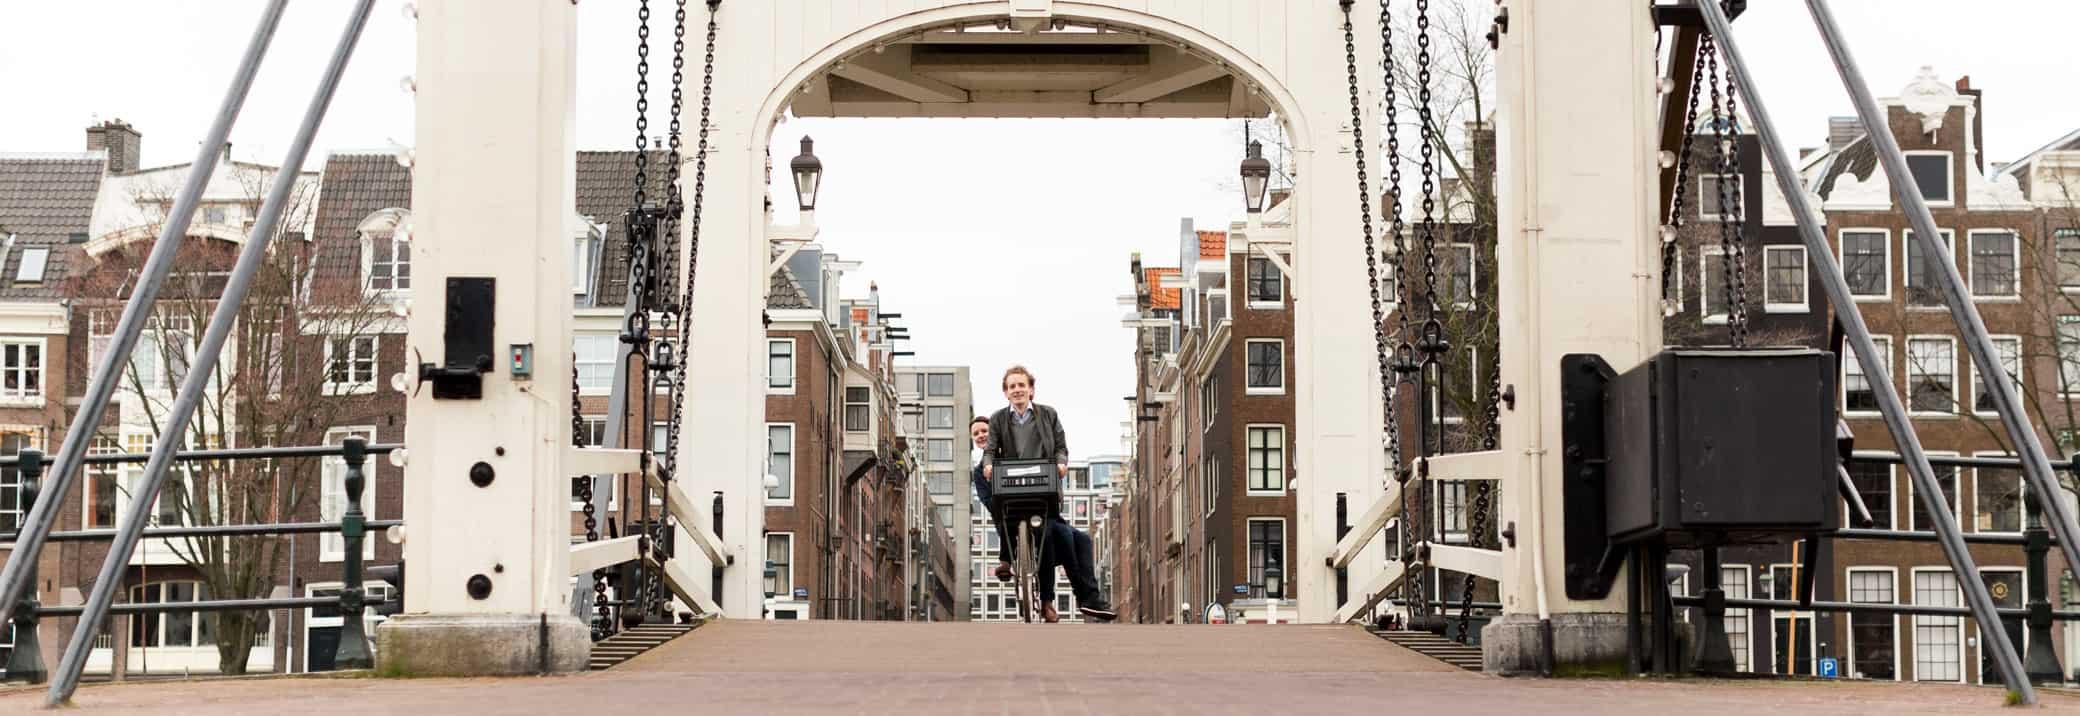 Photographer Amsterdam tourist